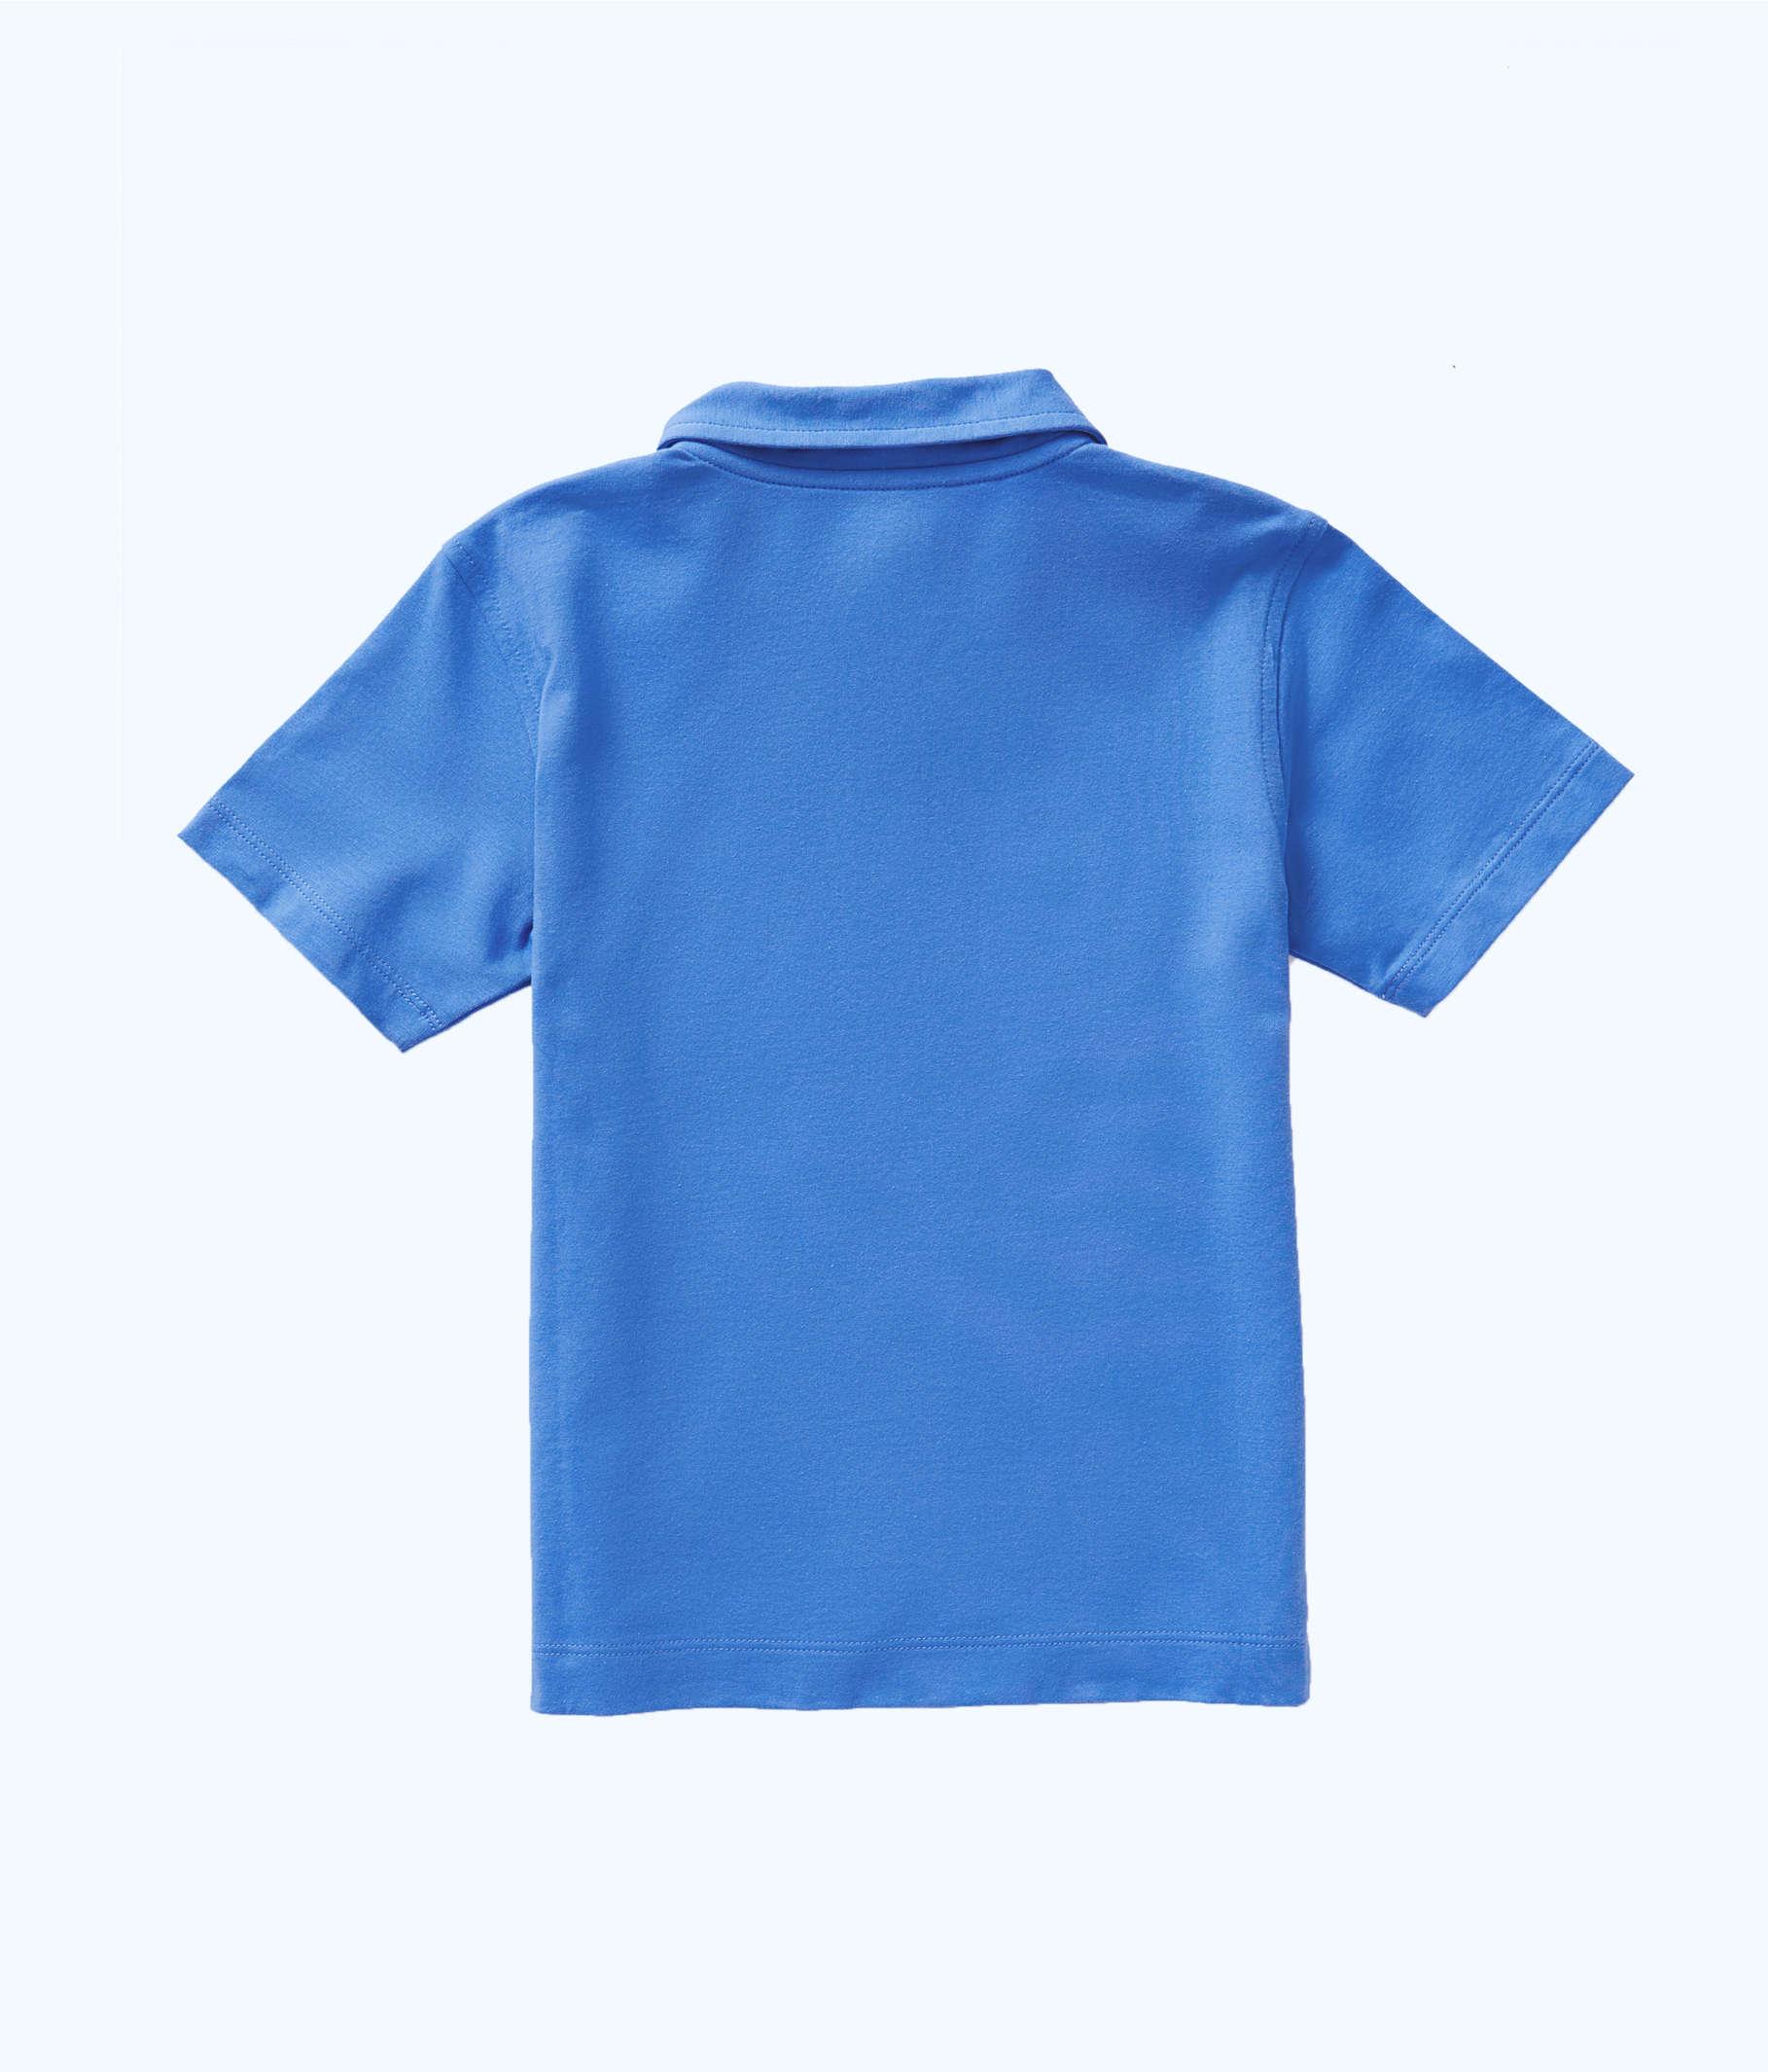 d8af113e Boys Polo Shirt | 001388 | Lilly Pulitzer